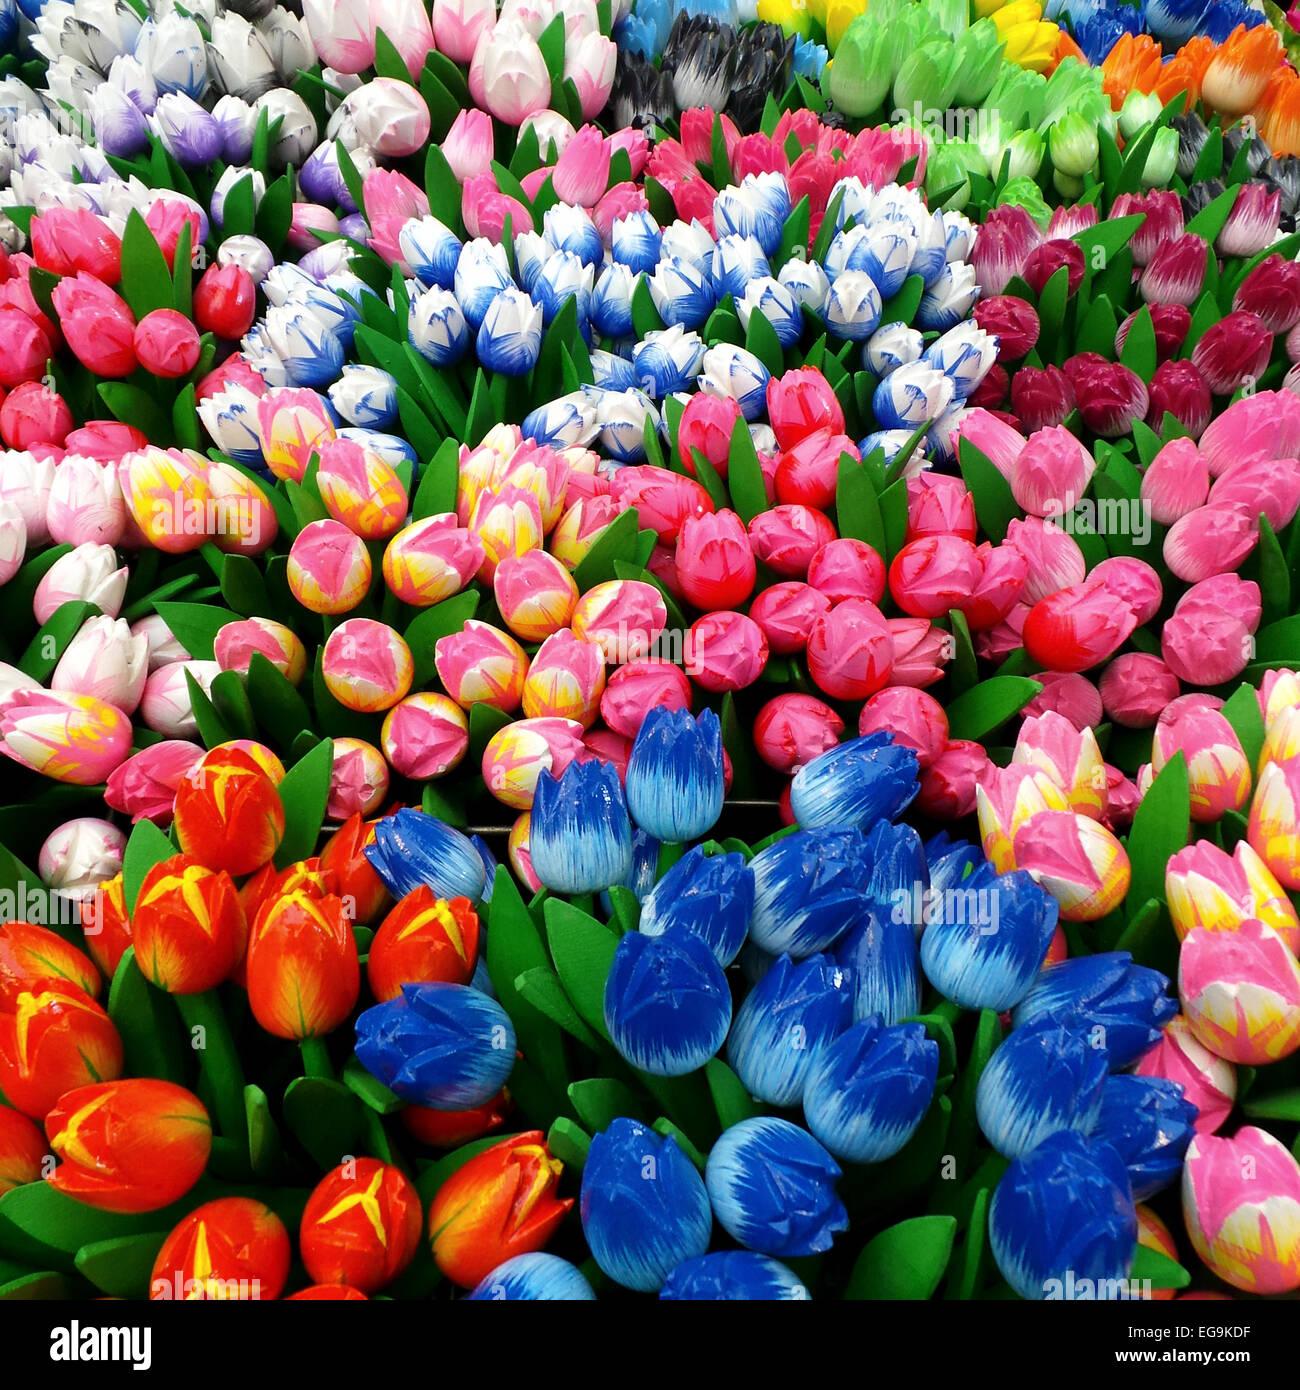 Multi colored tulips - Stock Image